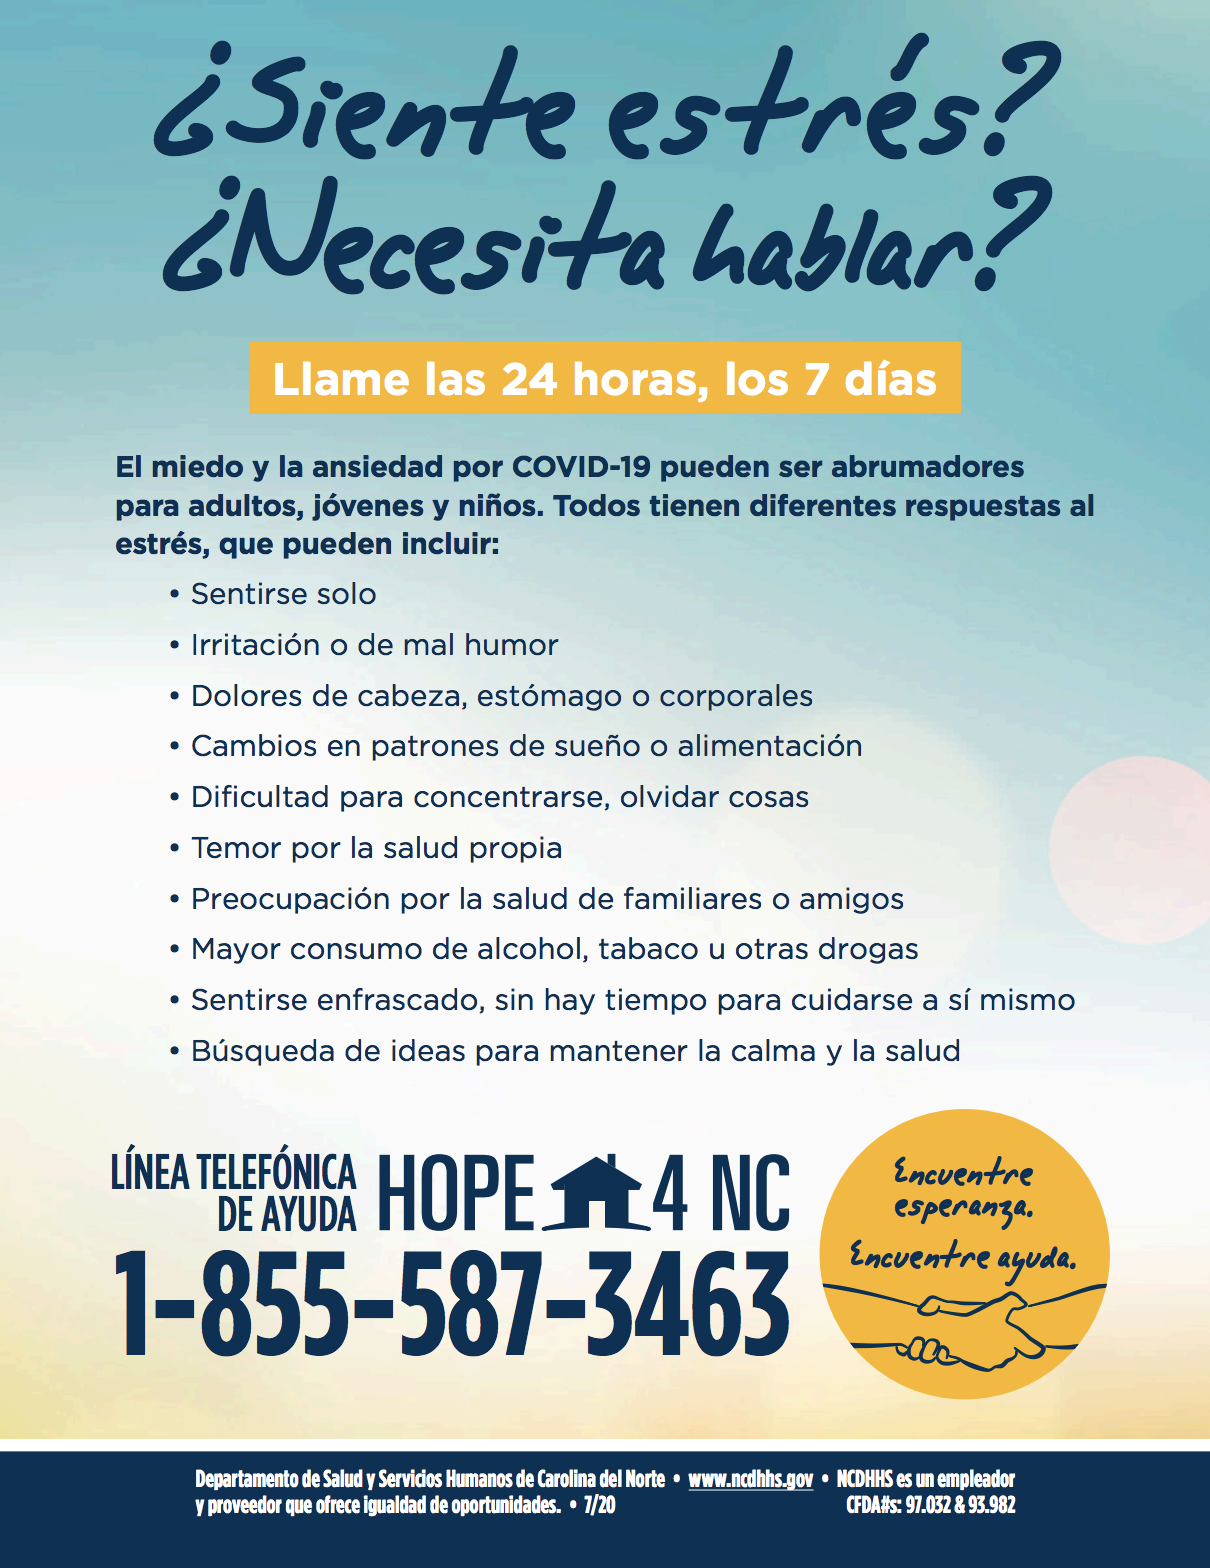 HOPE4NC Spanish